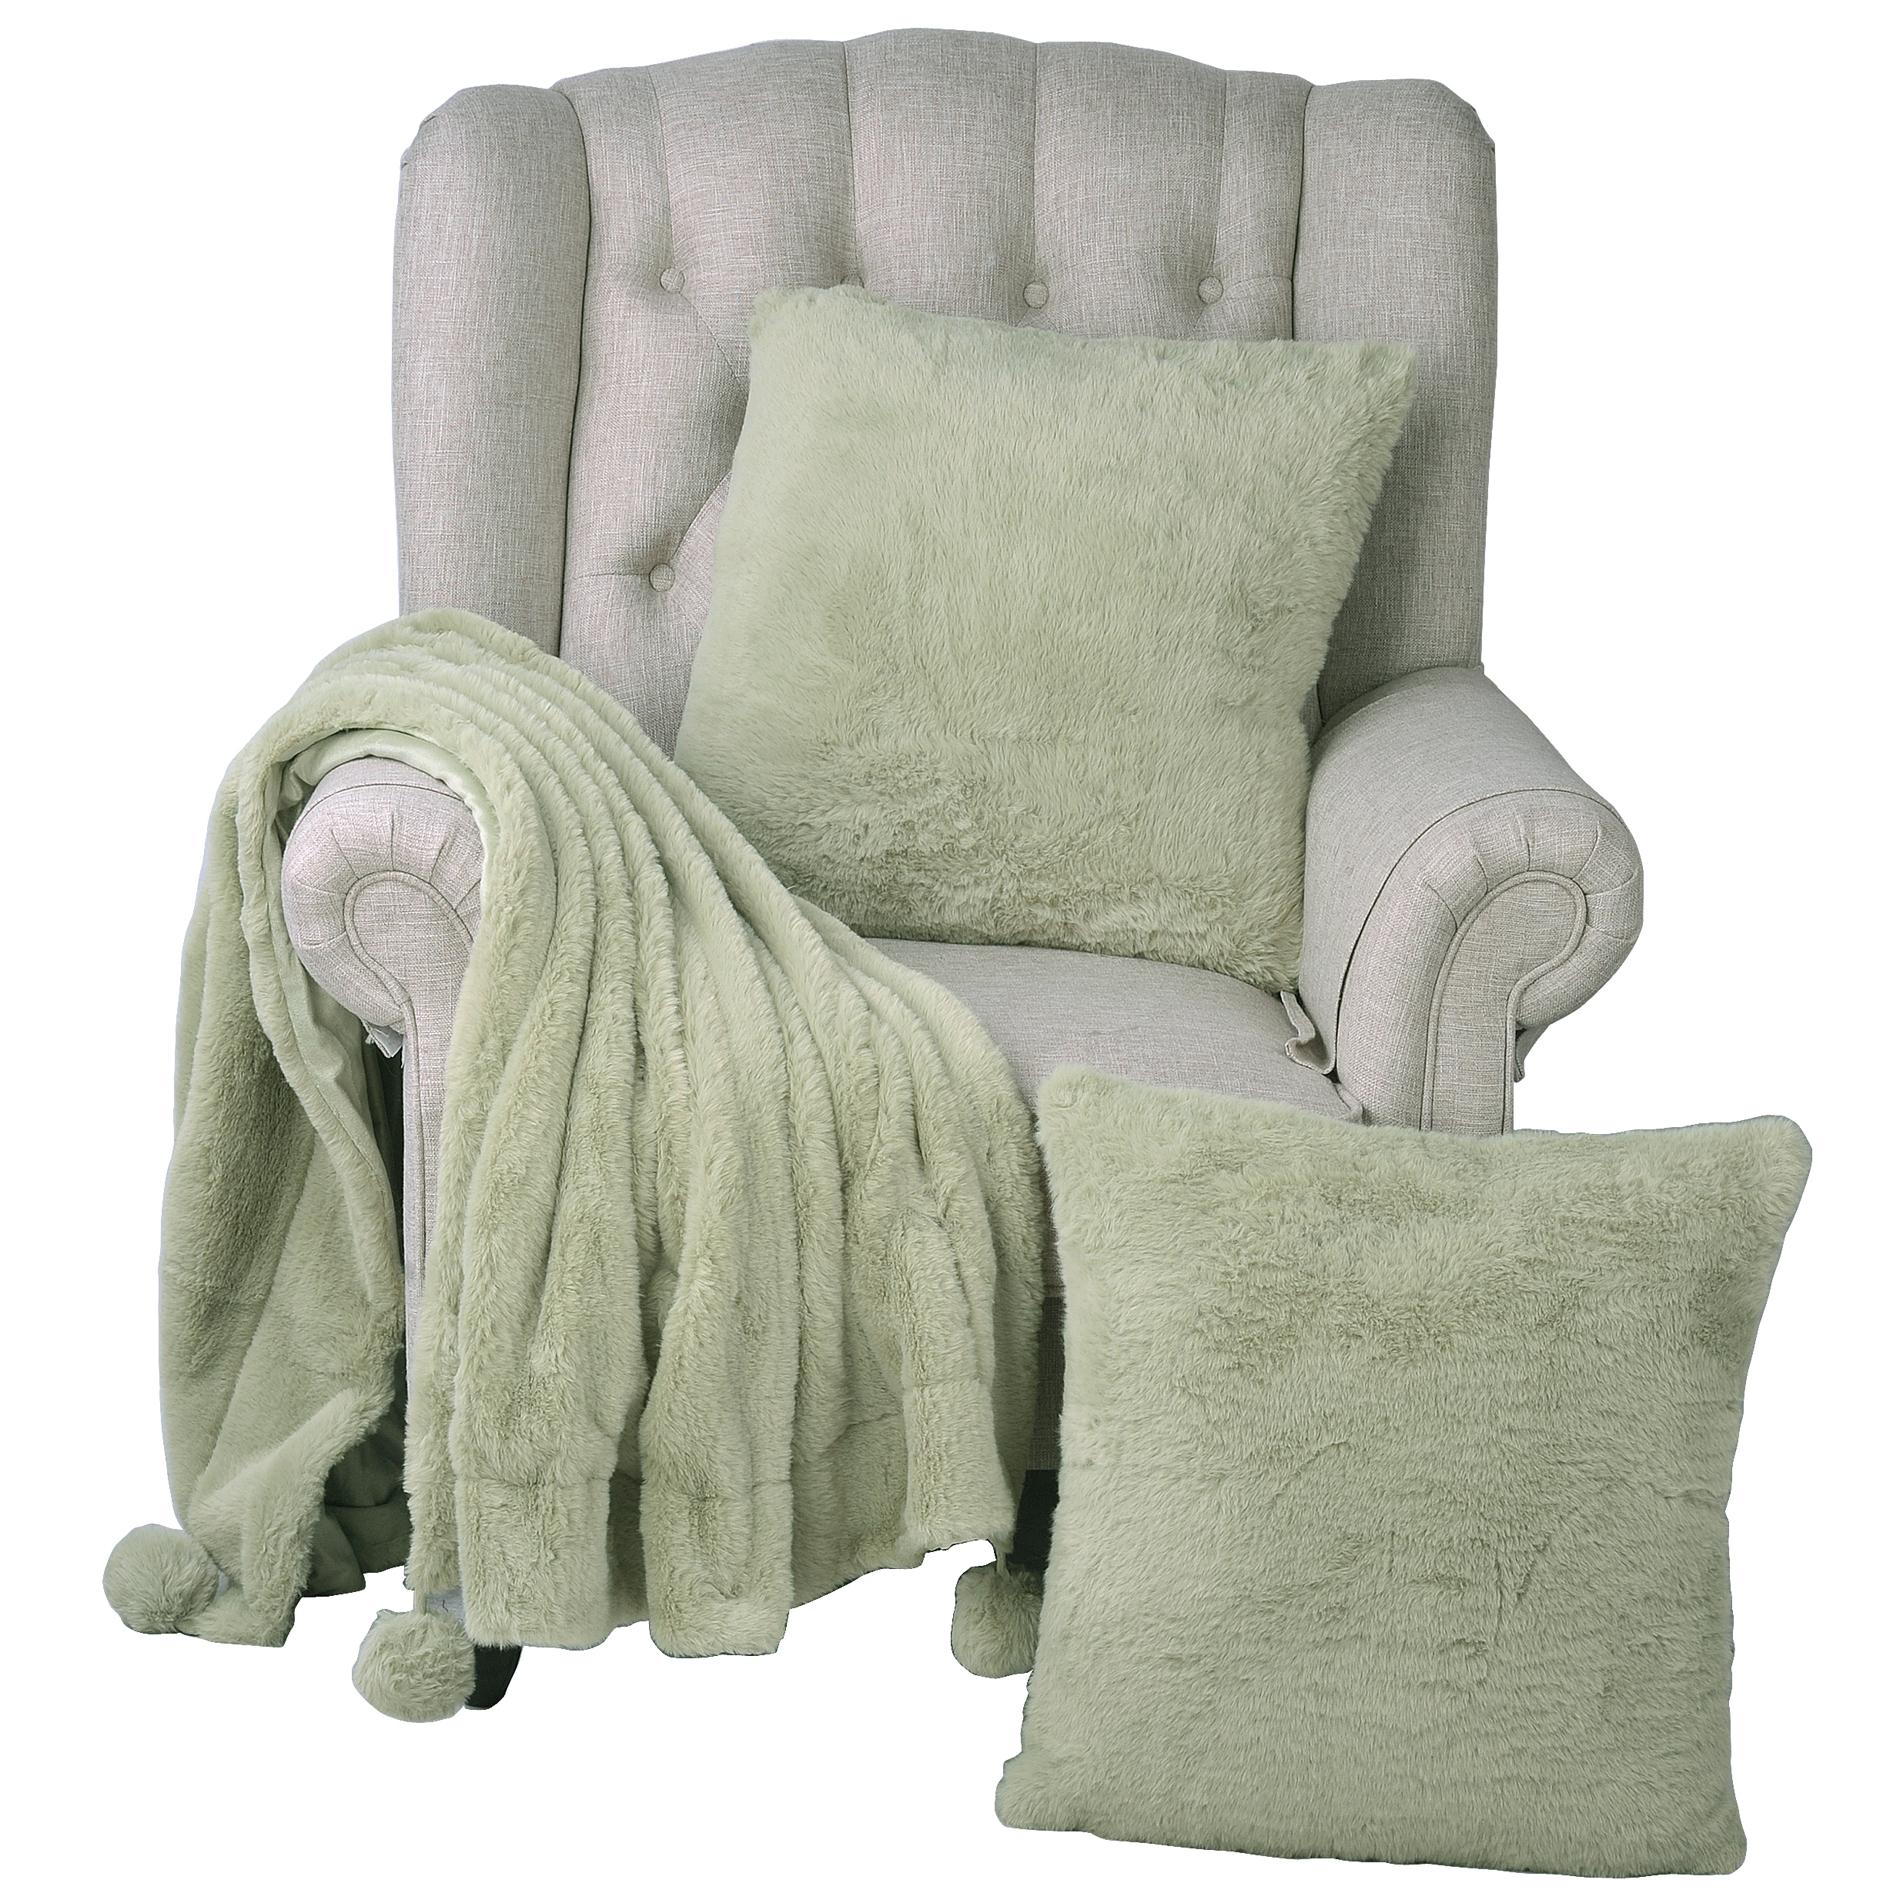 "Pompom Faux Fur Throw & 2 Pillow Combo Set , 50"" x 60"" / 20"" x 20"""